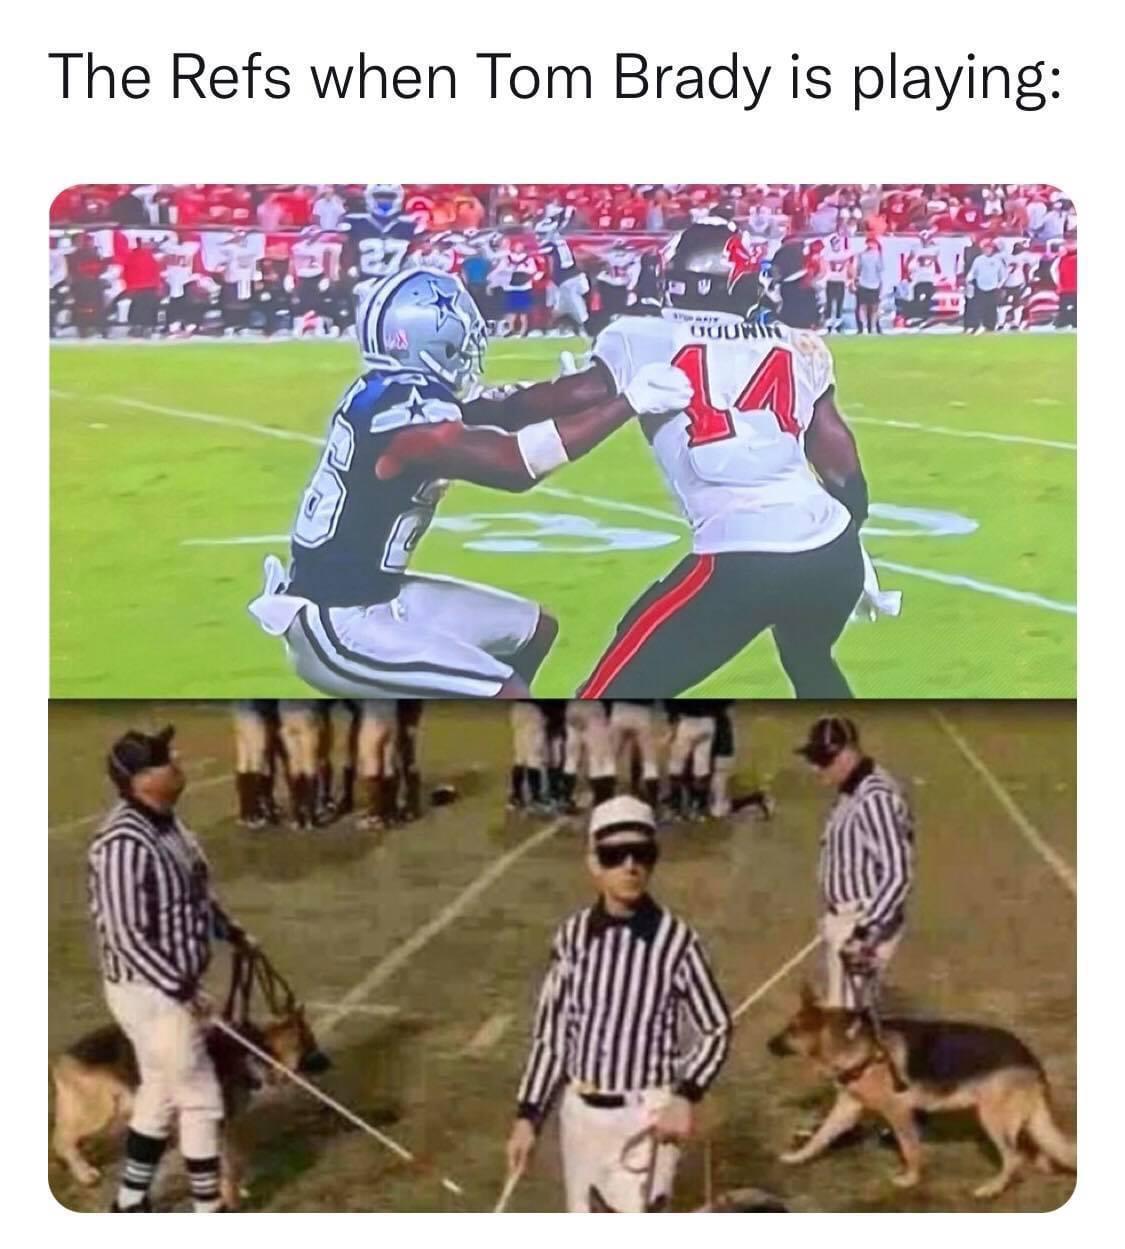 The refs when Tom Brady is playing meme